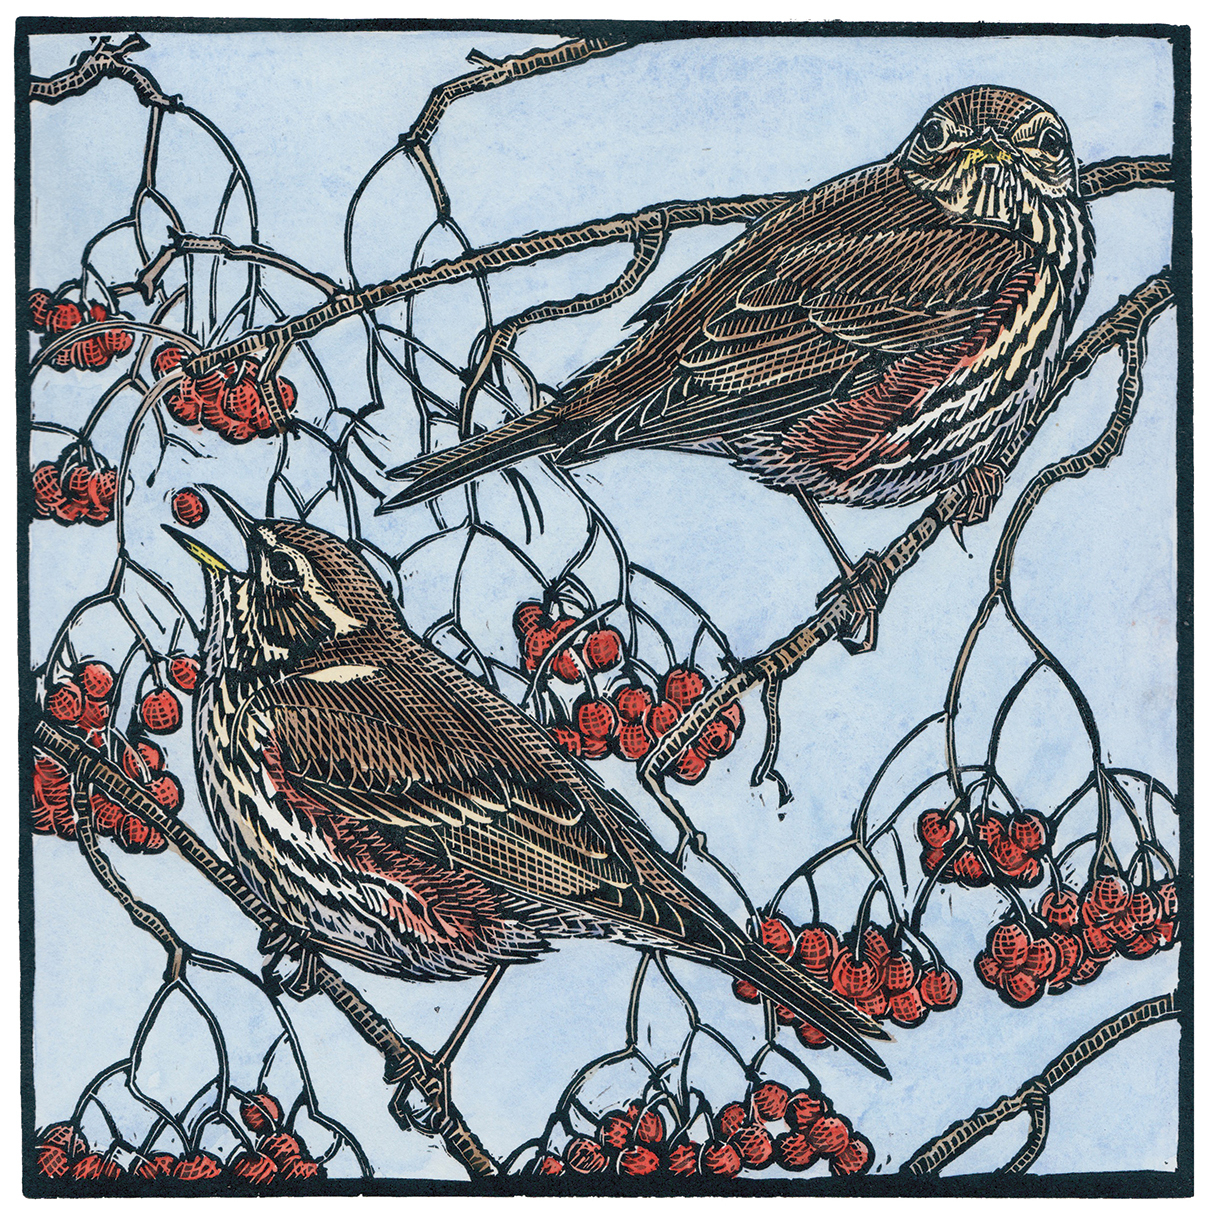 Redwings, Linocut and watercolour, 38 cm x 38 cm